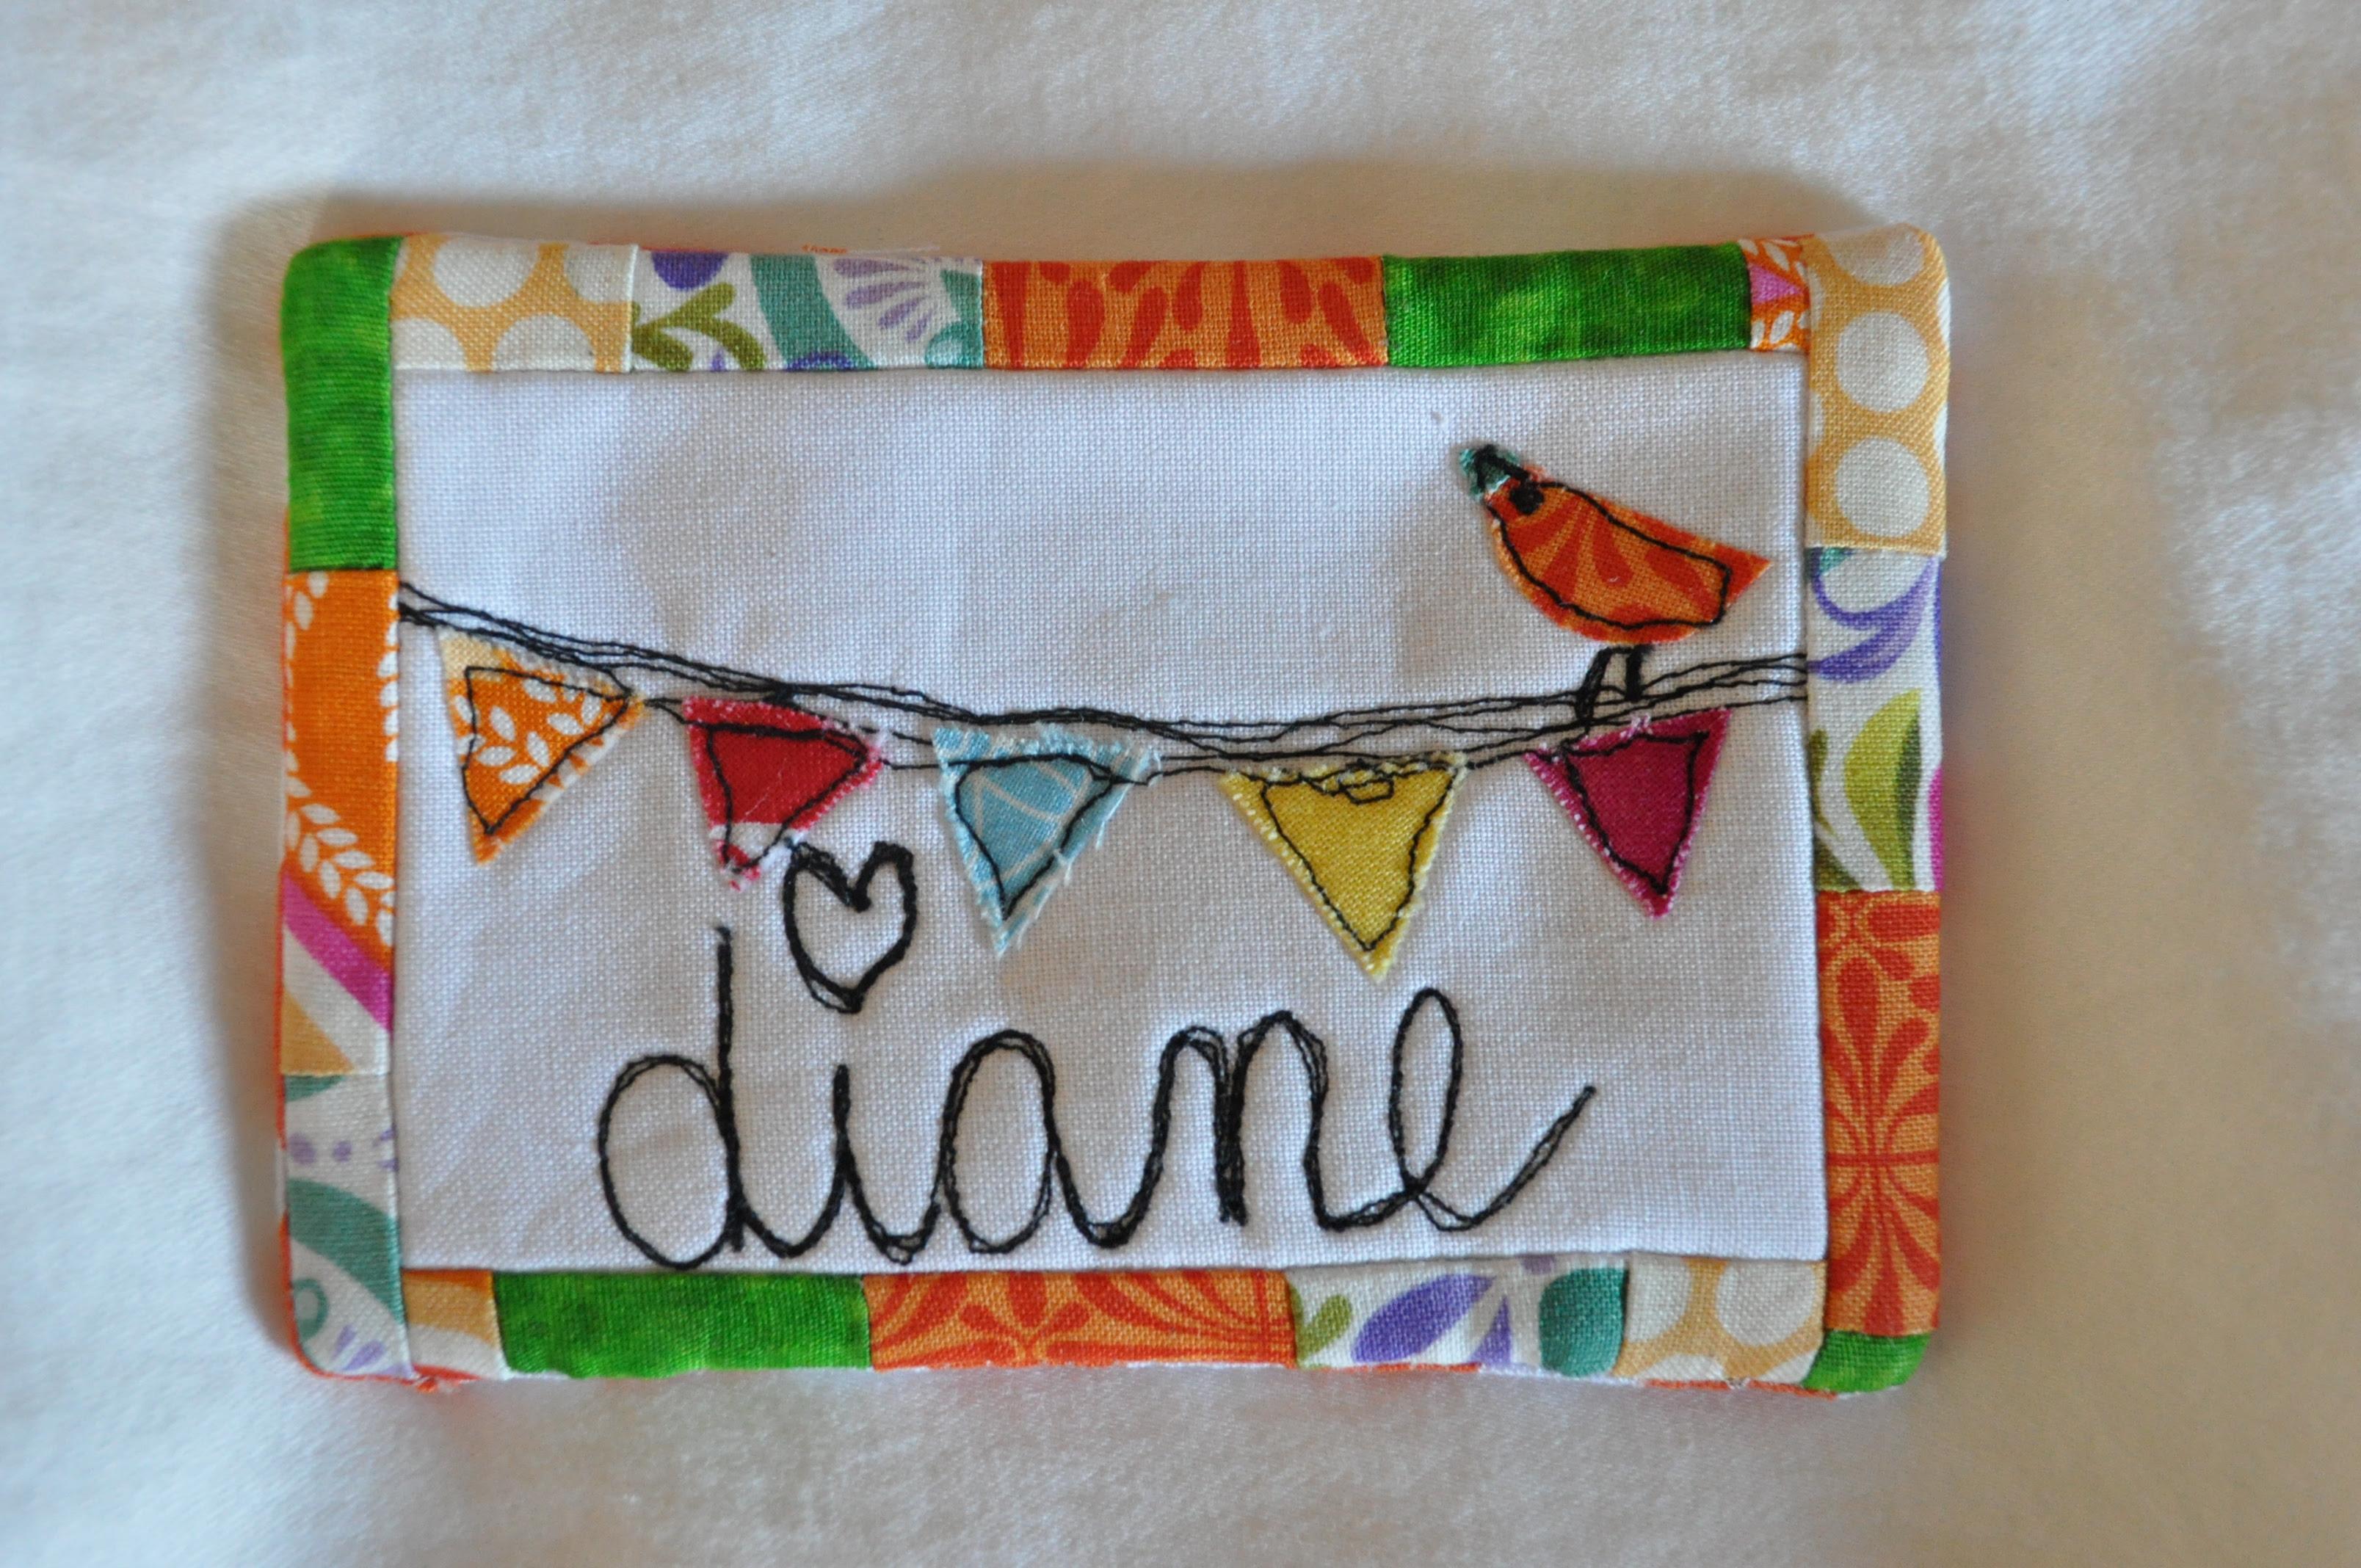 Sewing Summit name tag